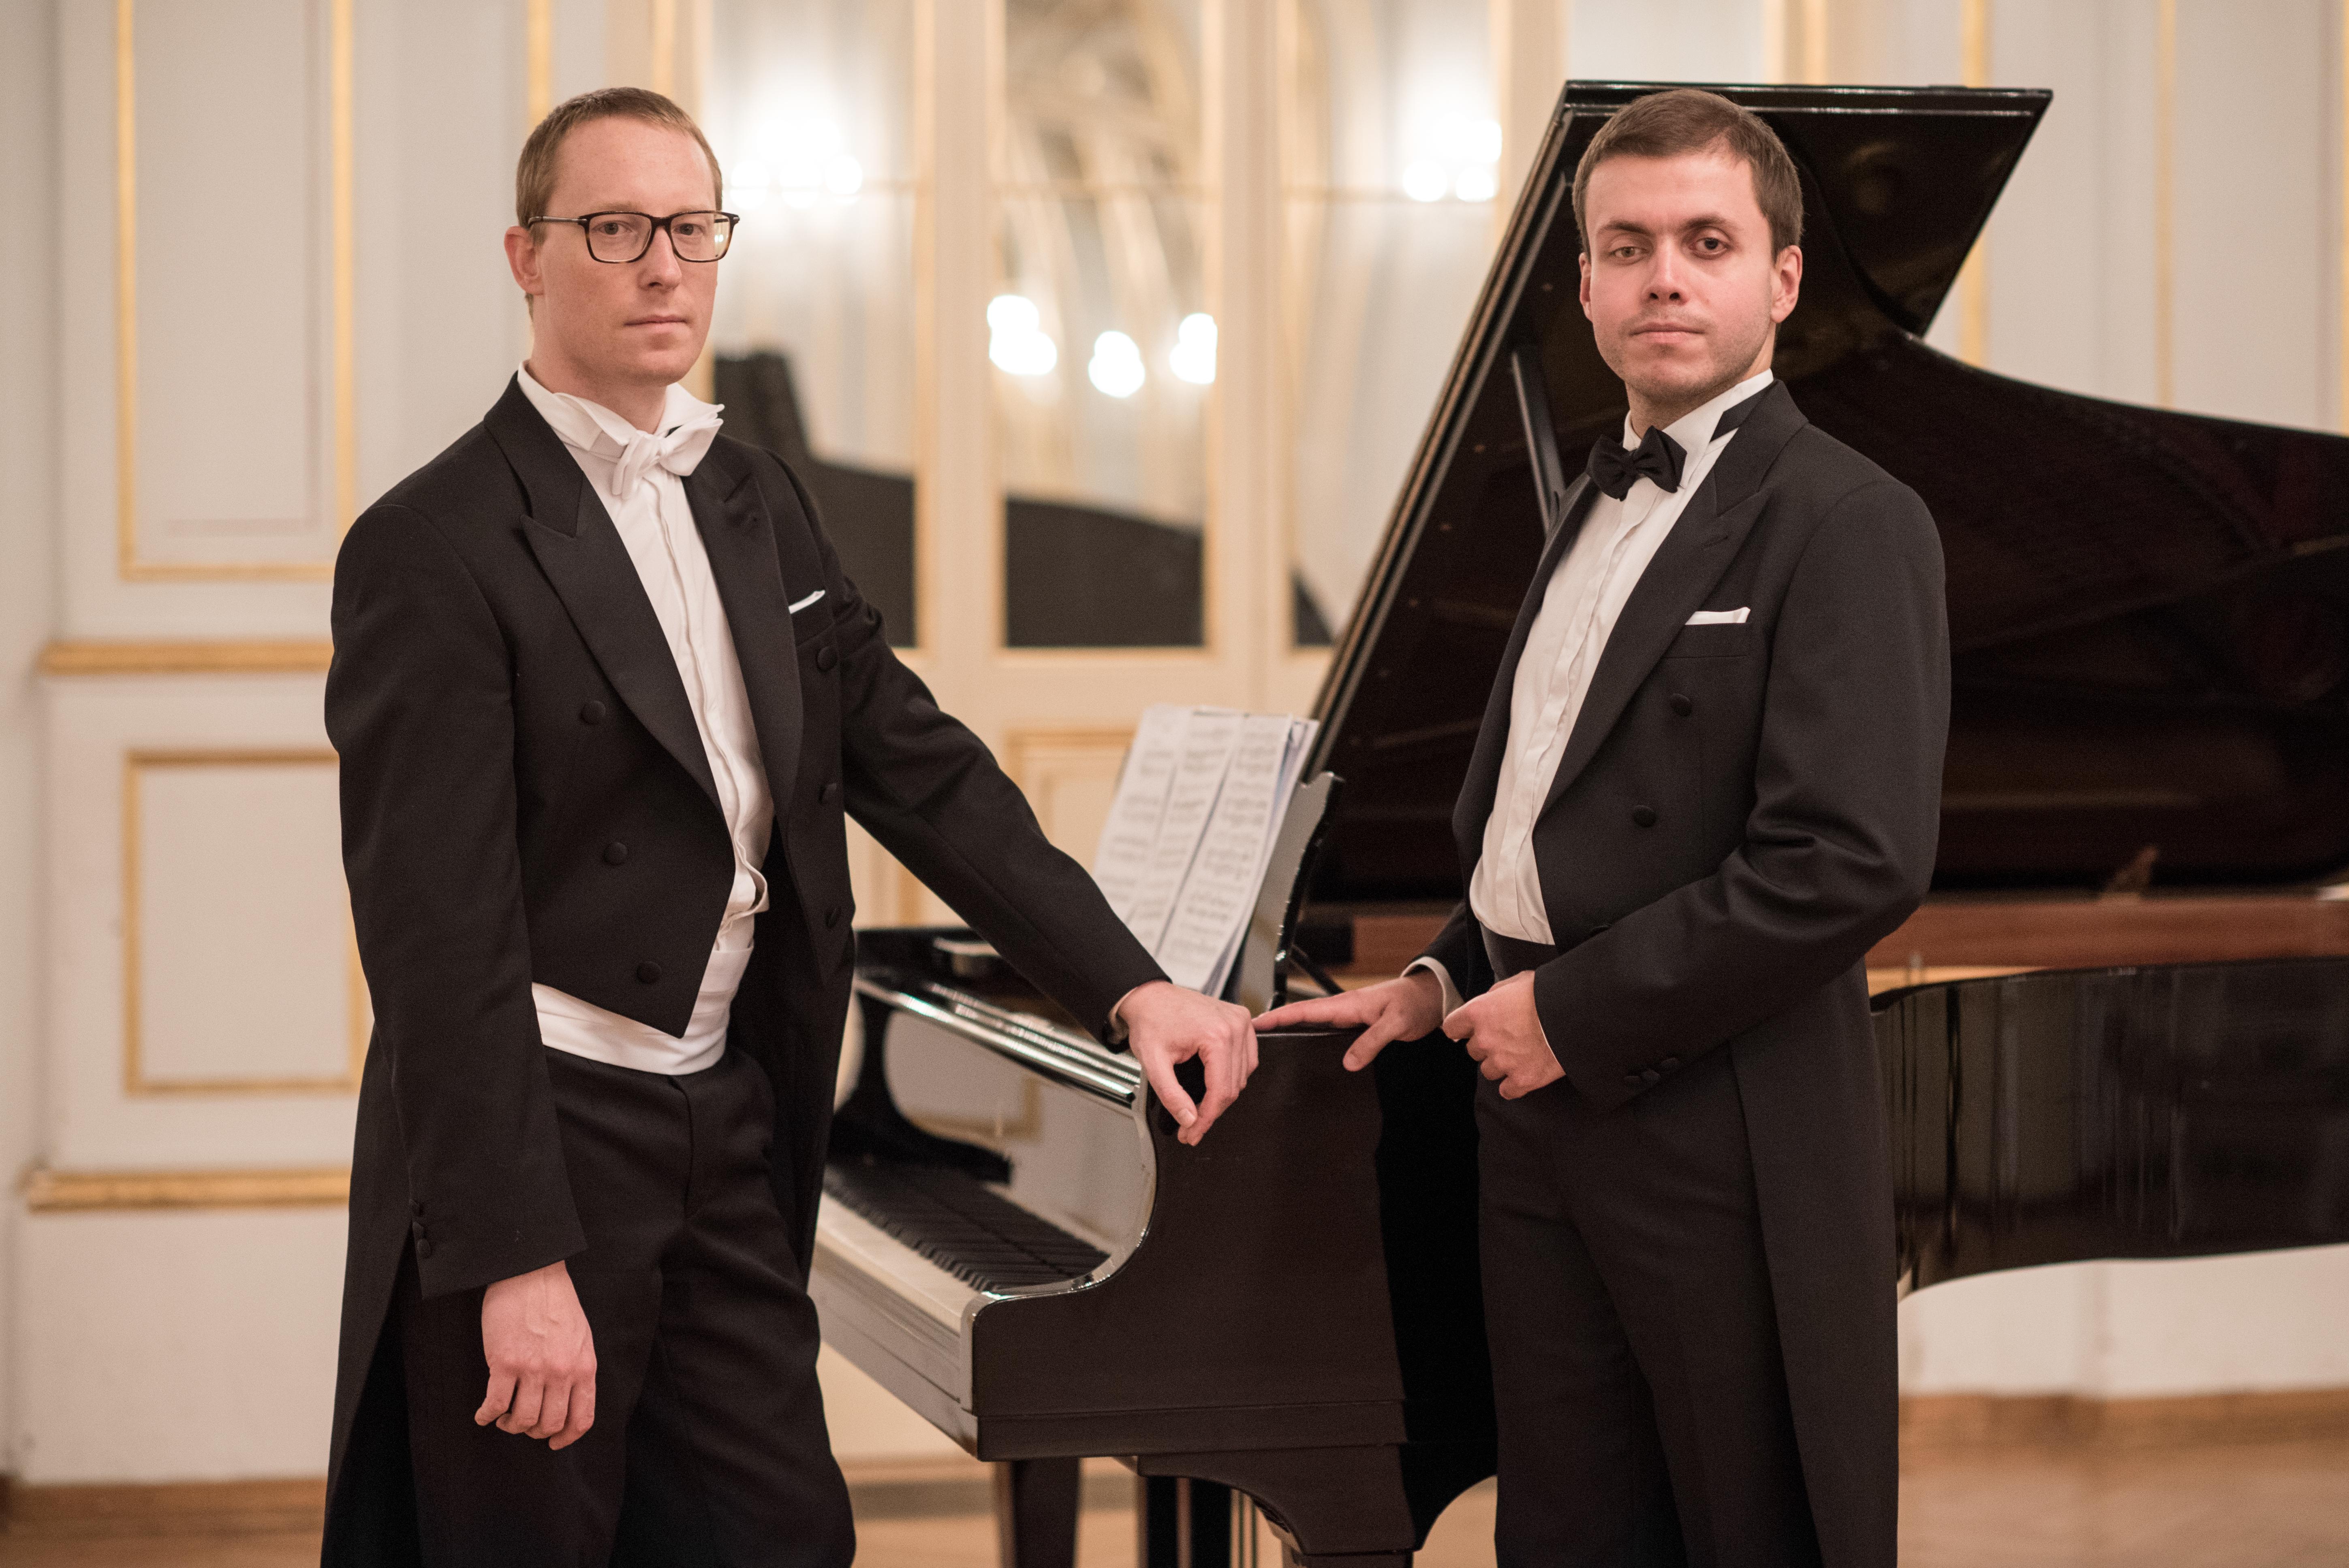 Nejc Lavrenčič & Artur Rożek